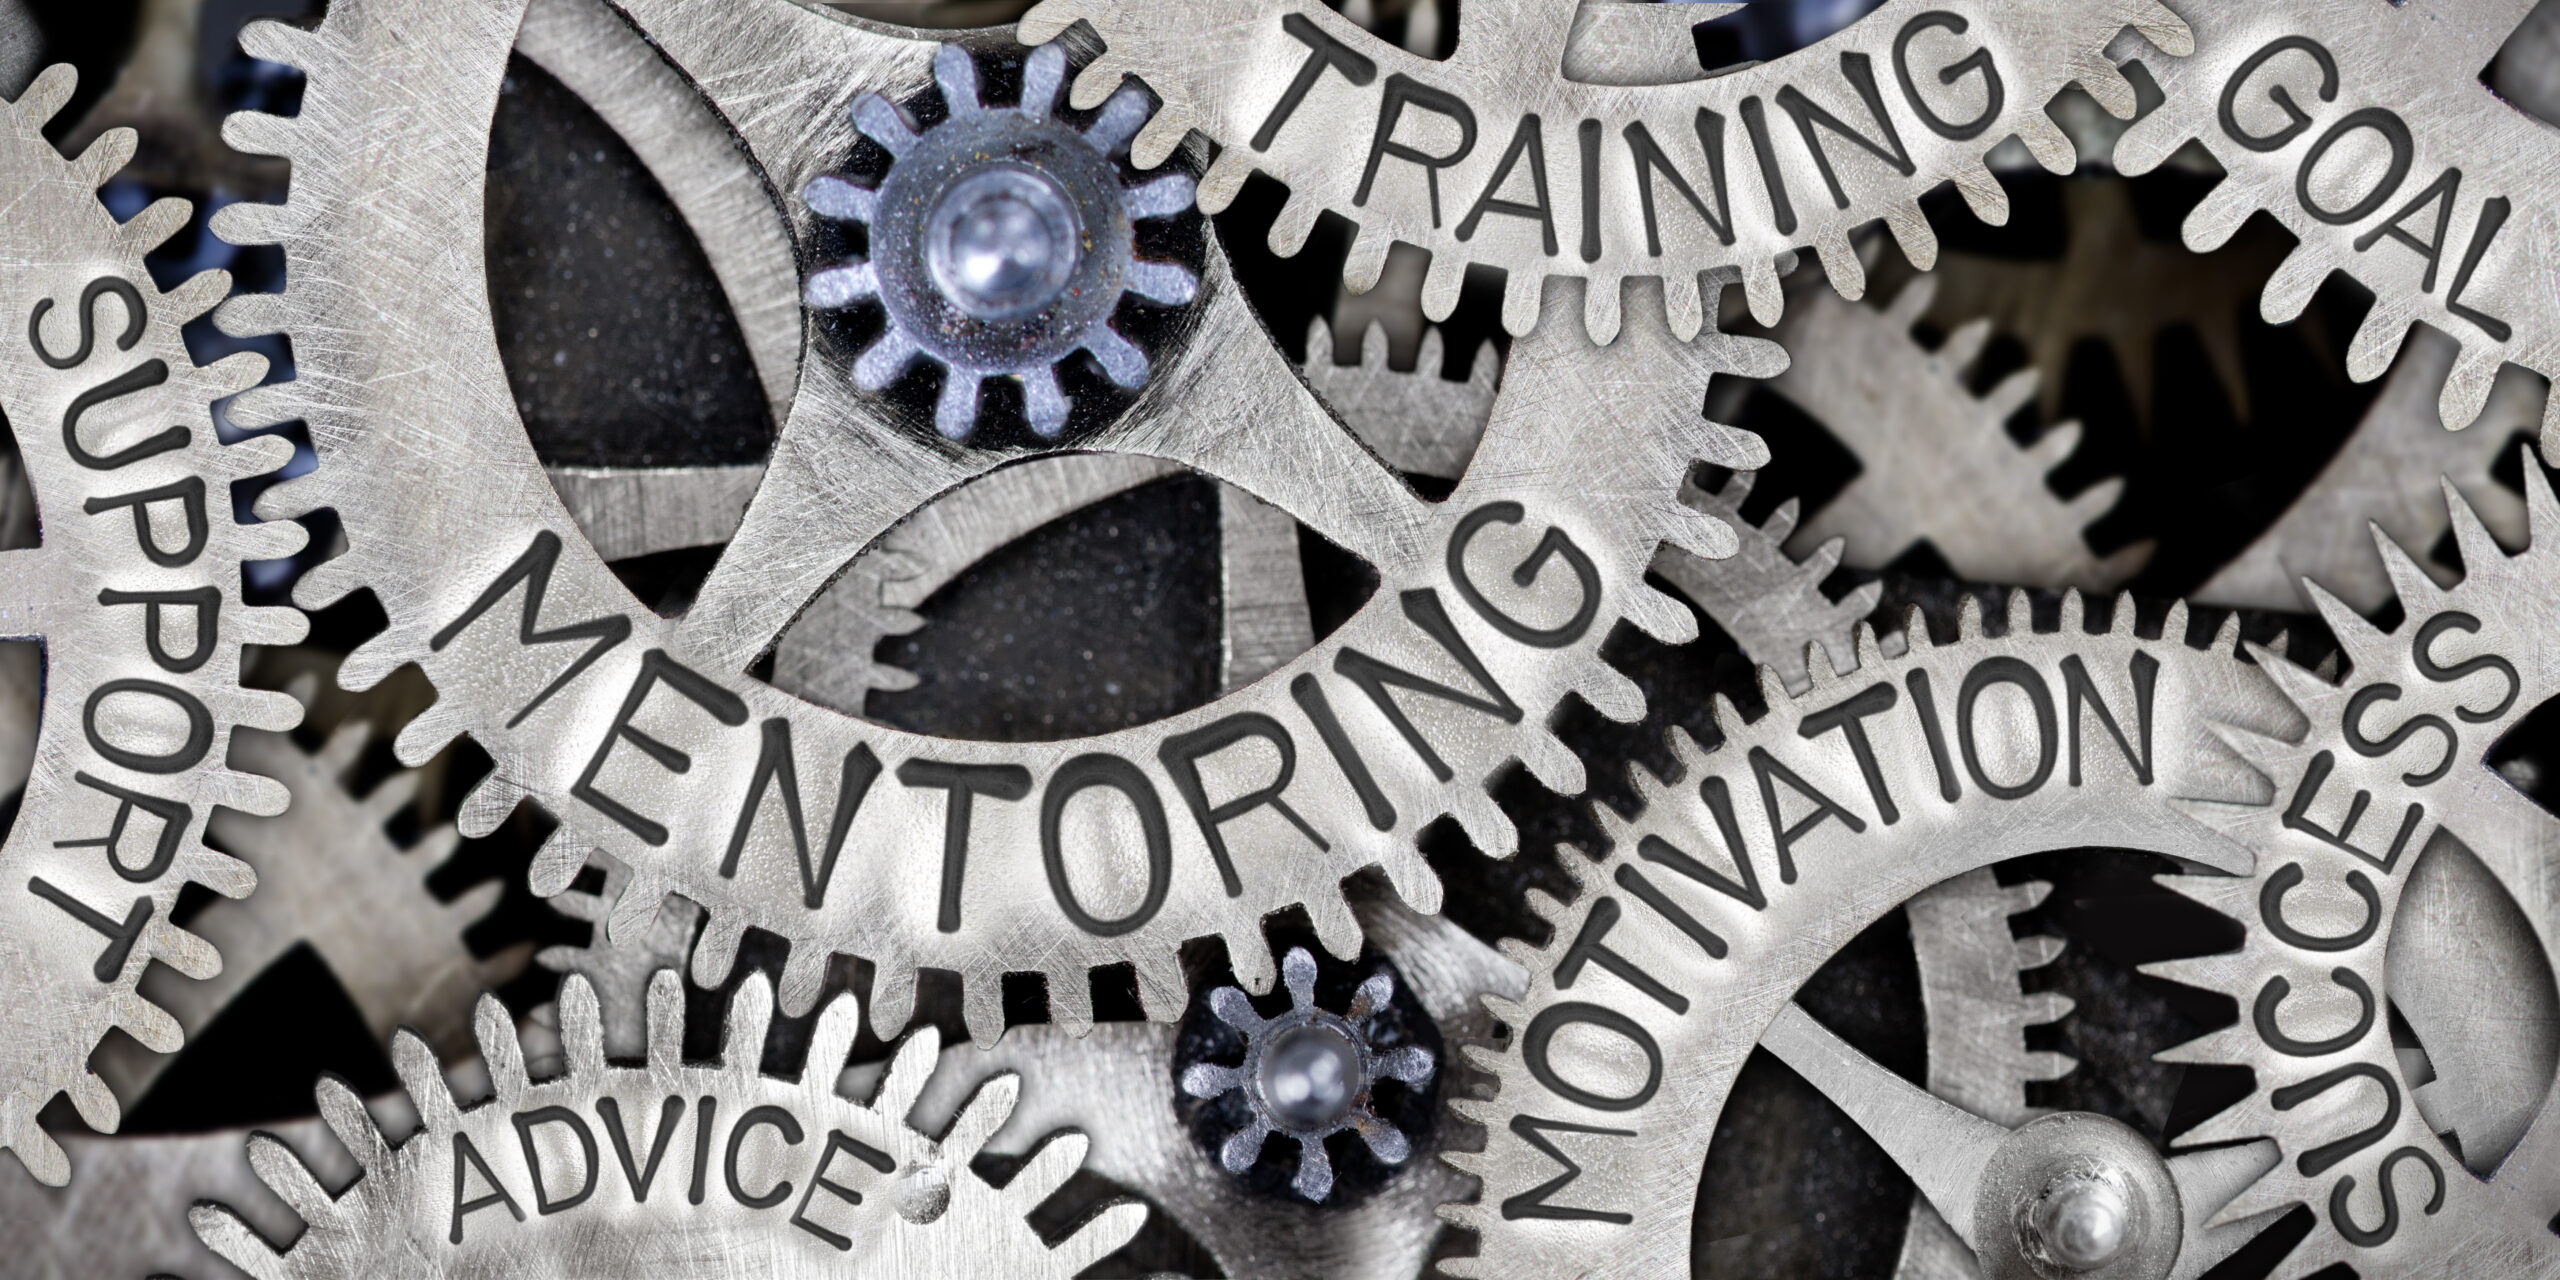 https://conflictinsights.co.uk/2021/06/10-insights-into-mediation-mentoring/